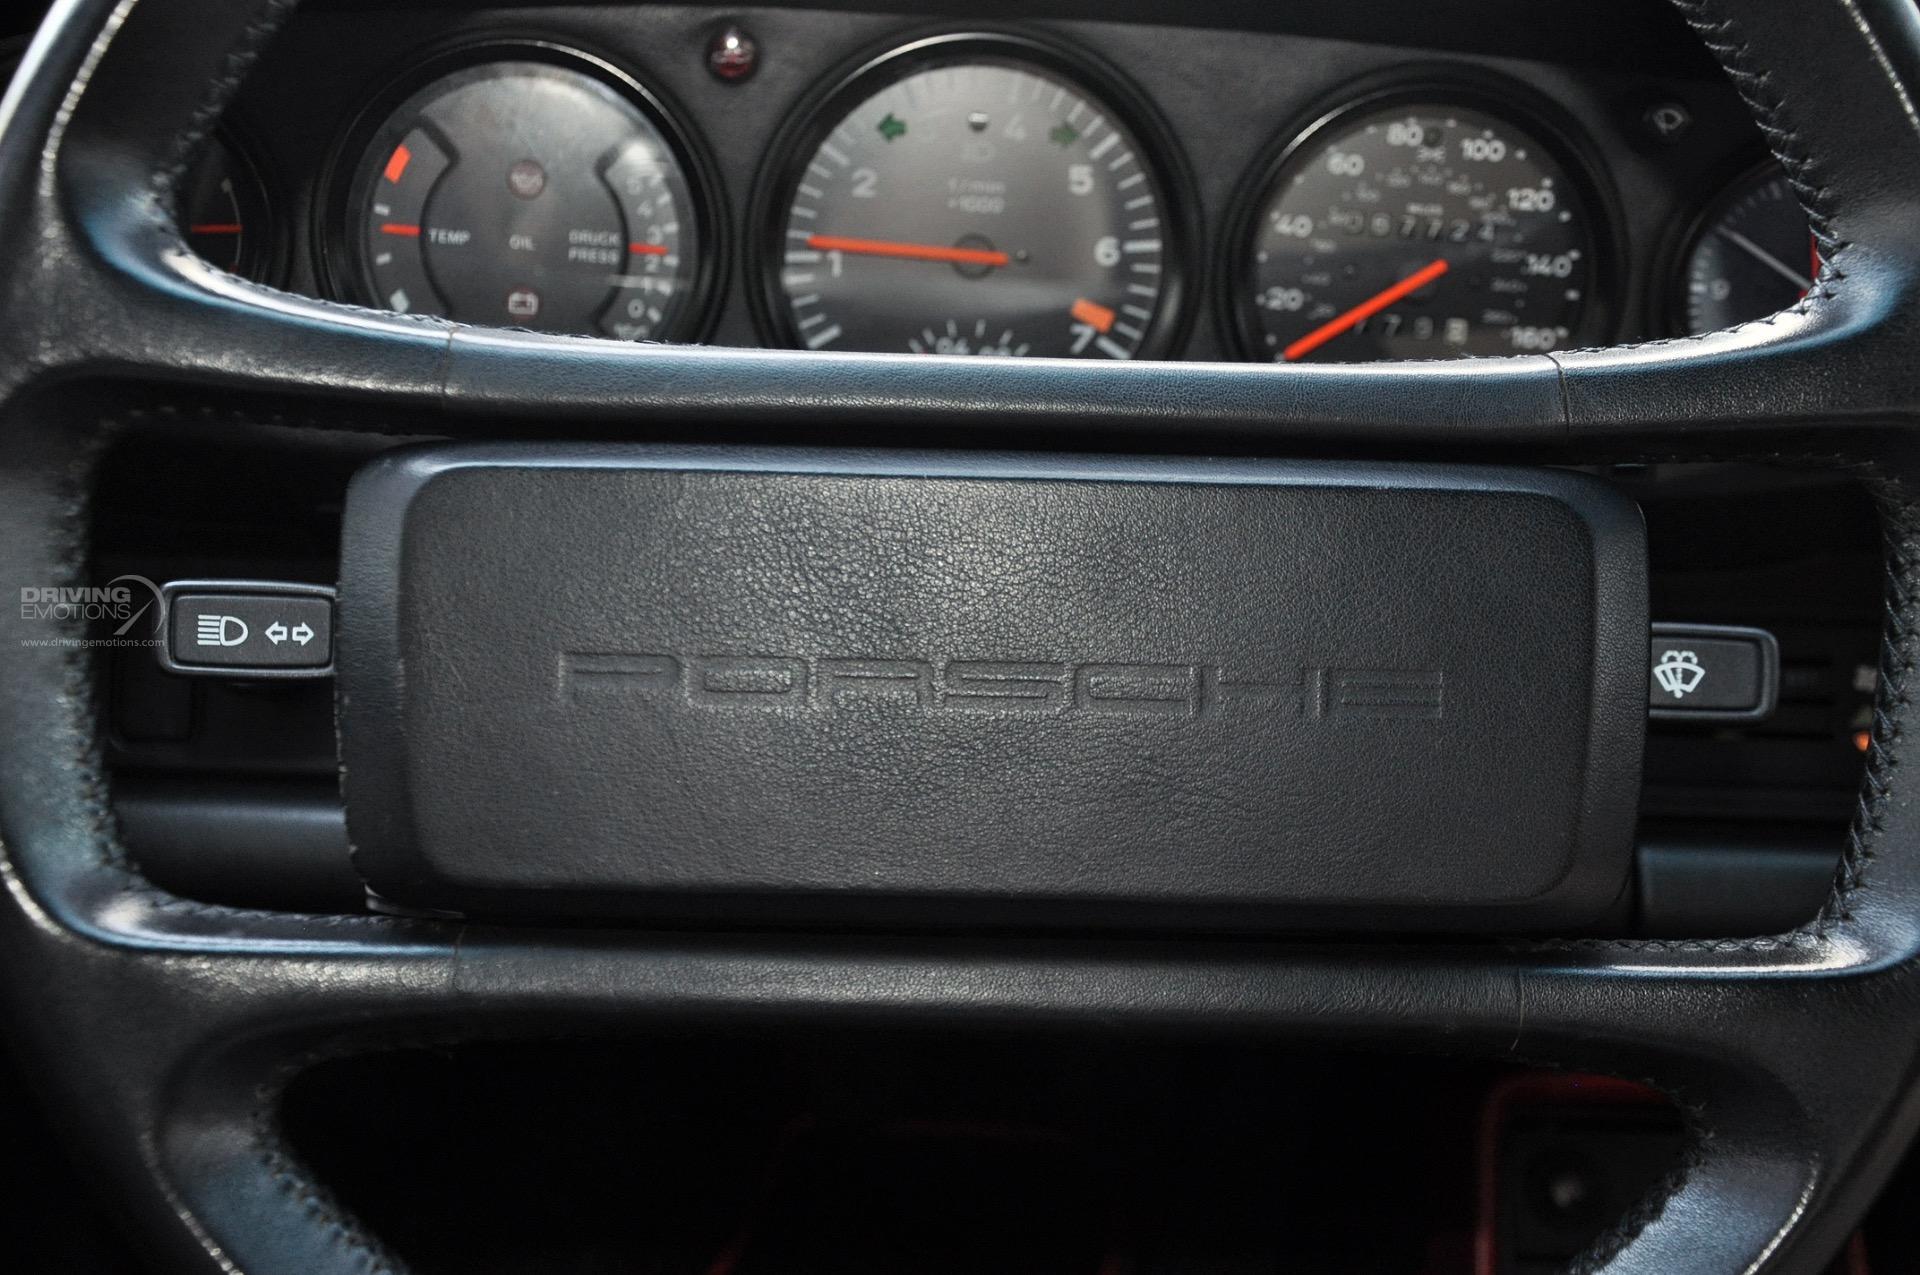 Used 1987 Porsche 911 930 Turbo Cabriolet Slant Nose Carrera Turbo Slant Nose   Lake Park, FL